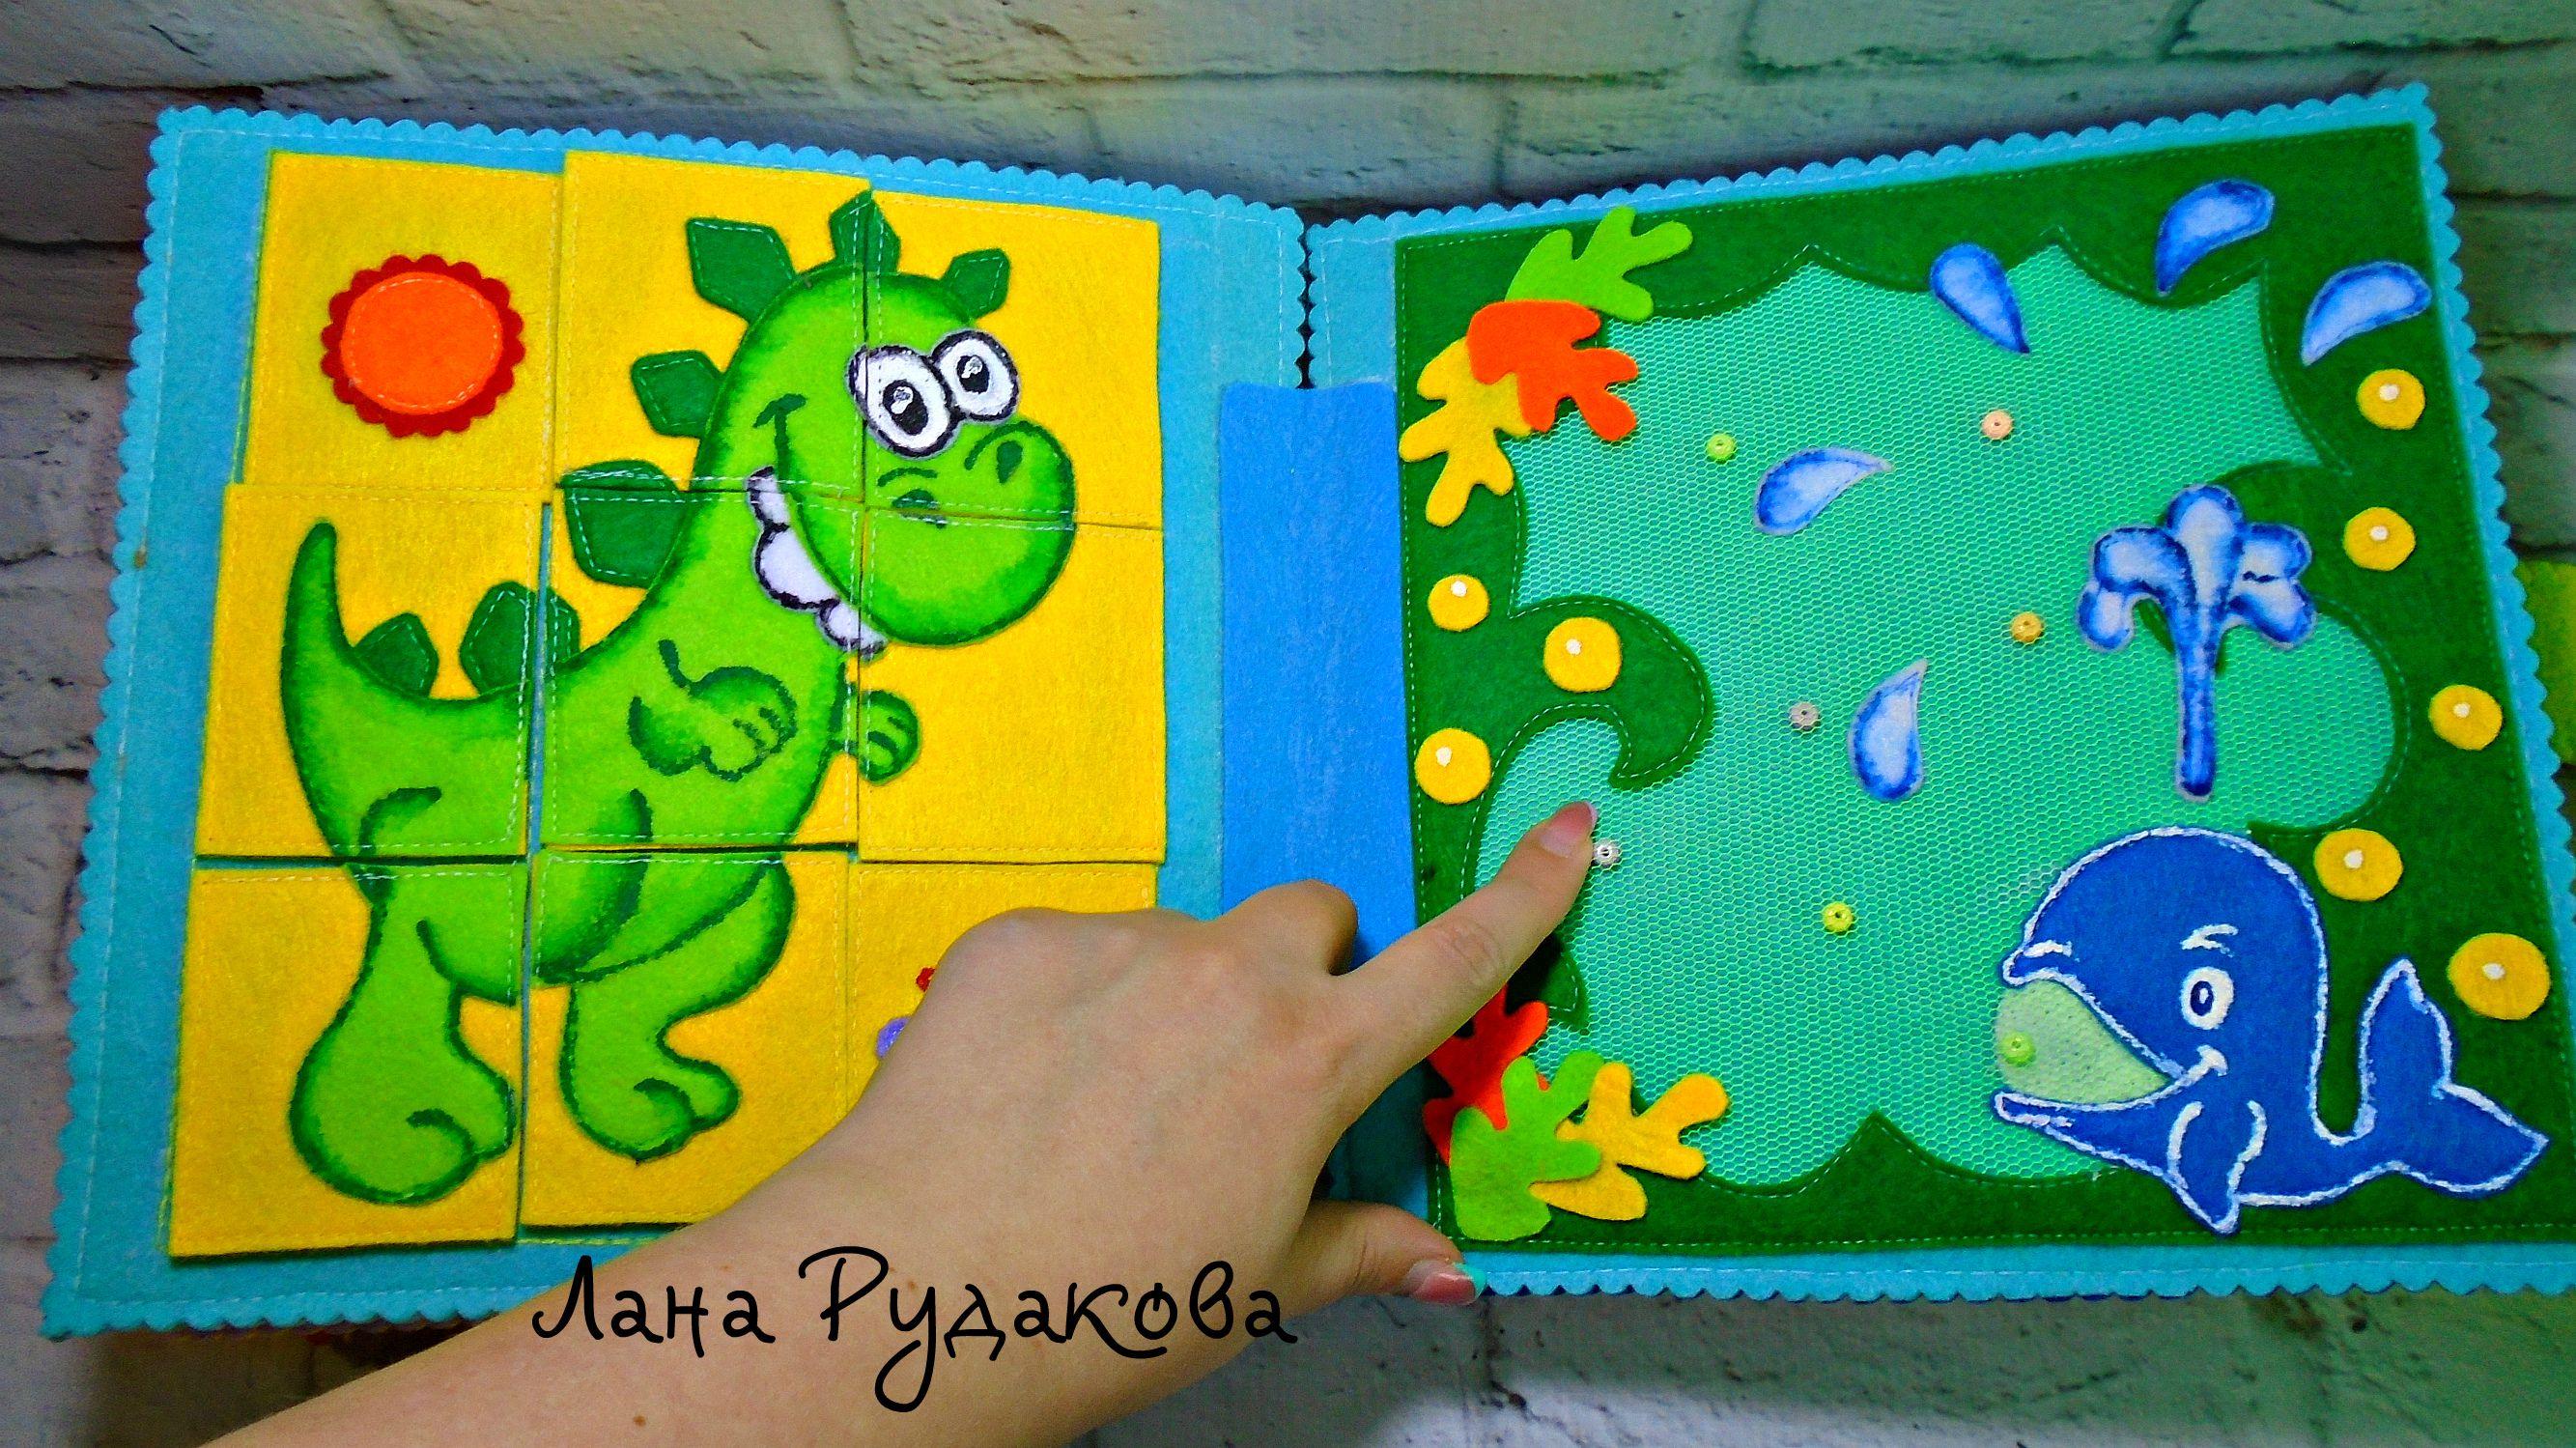 подарок книги моторика фетр детям развивашки фетра логика развитие книгииз малышам